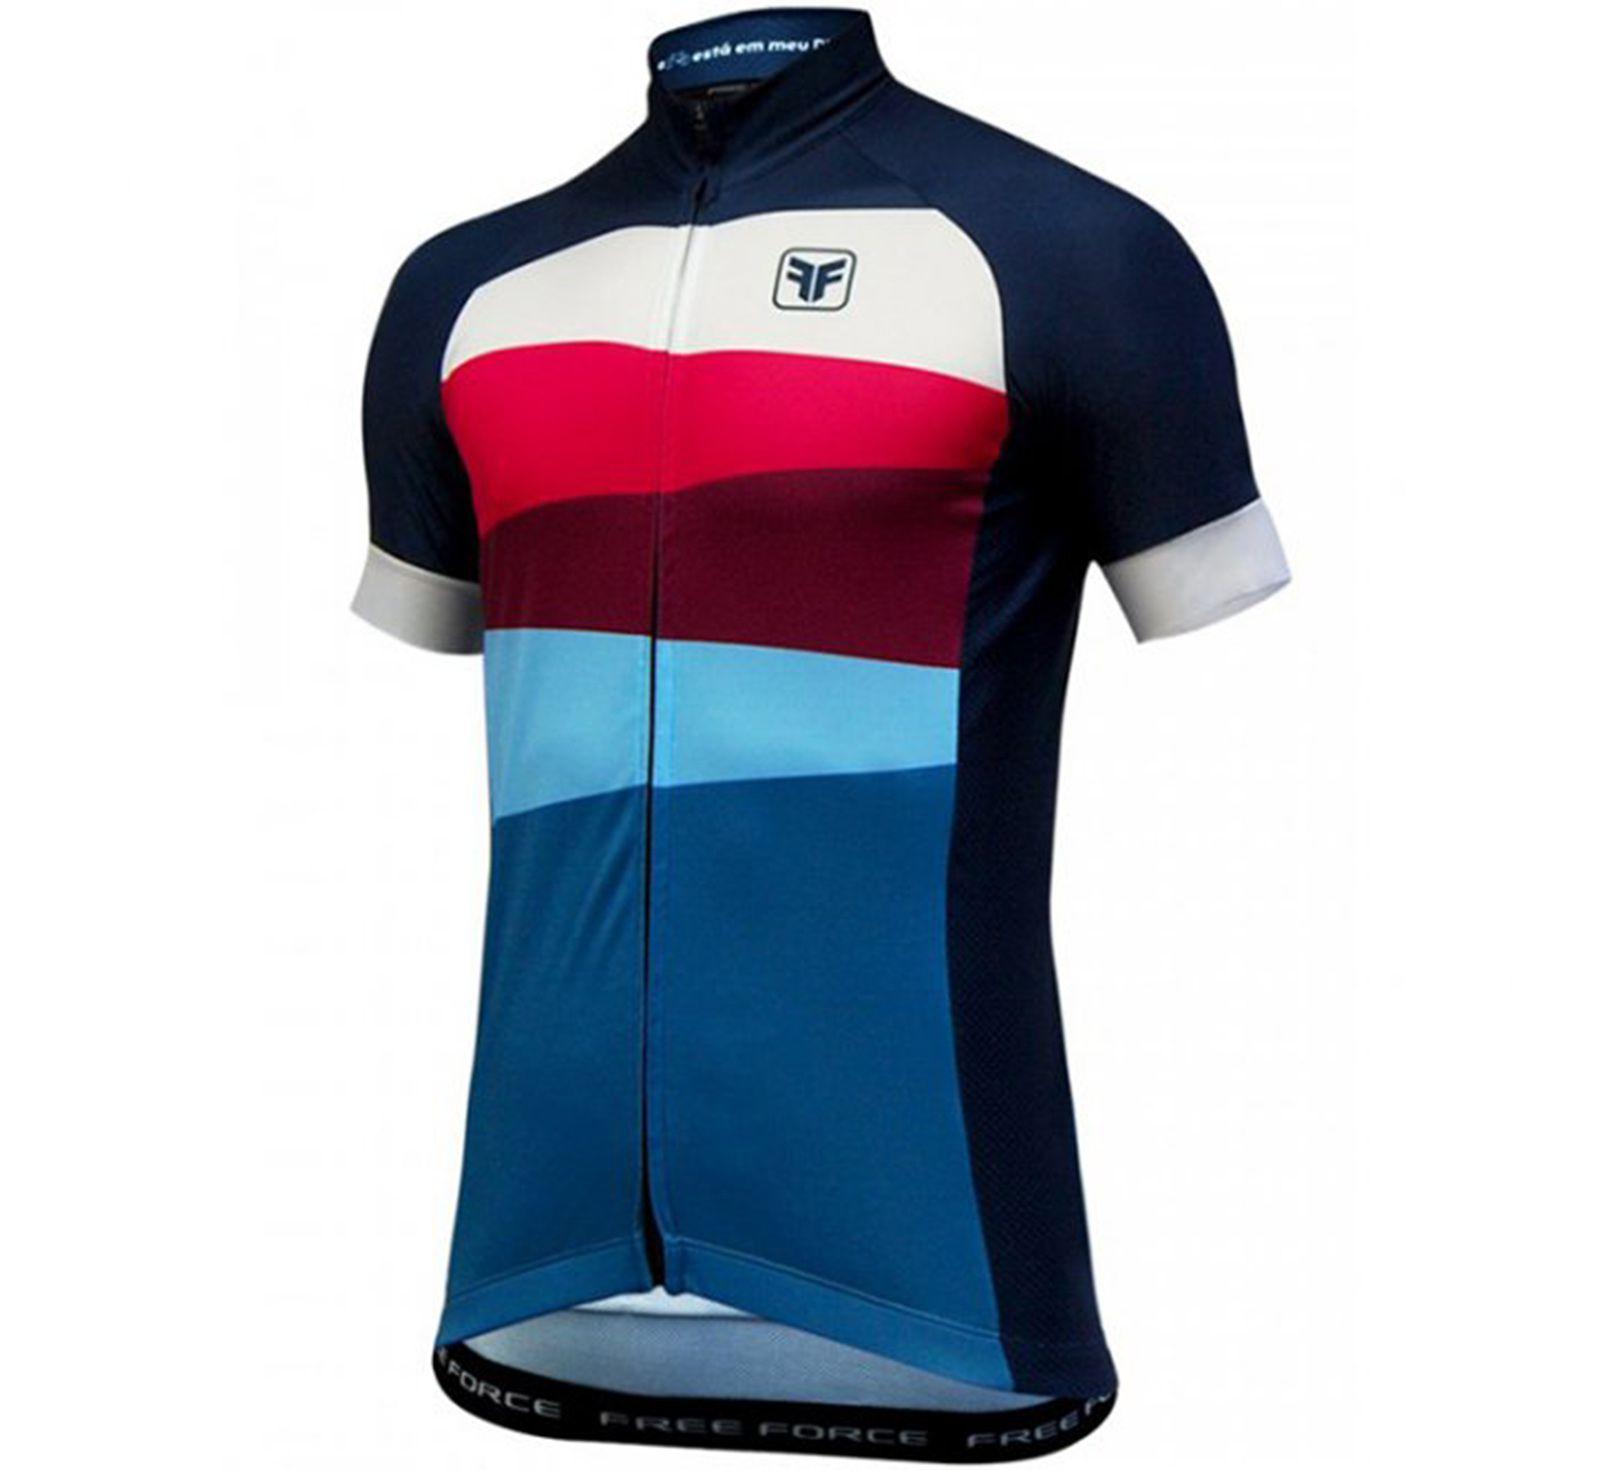 Camisa Ciclismo Masculina Flush - Free Force